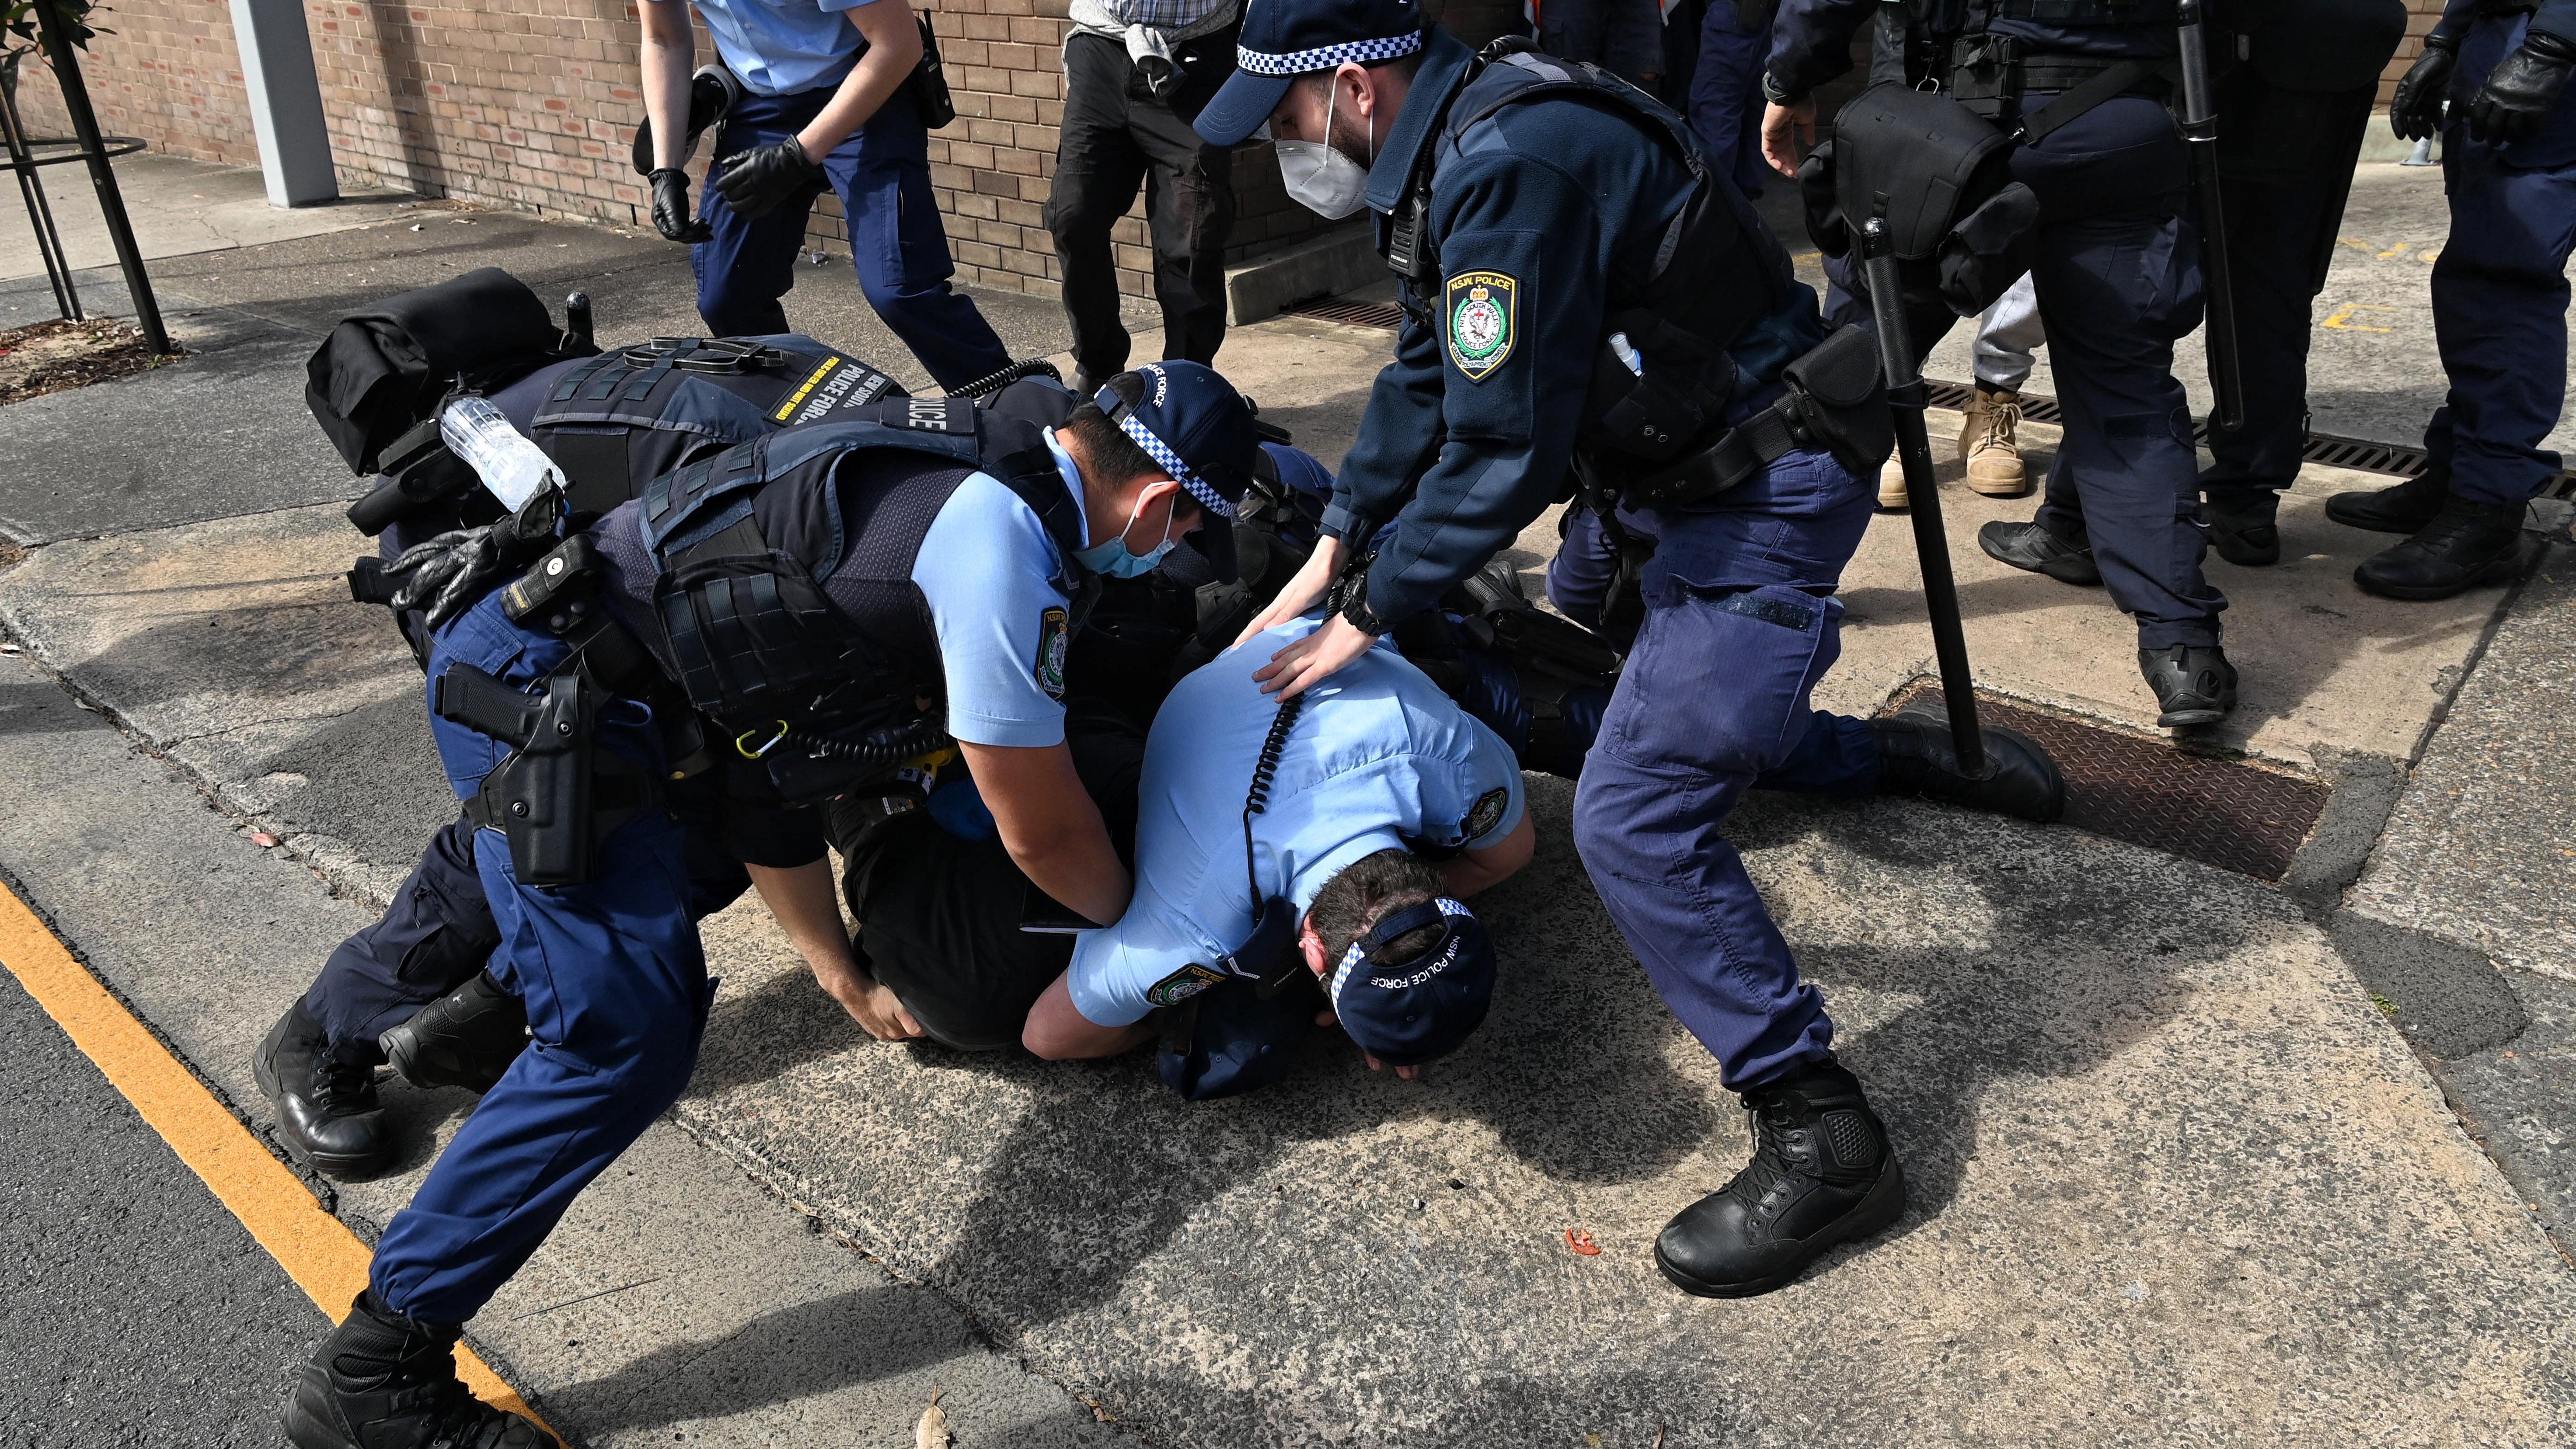 Police arrest protestors at Victoria Park in Sydney.